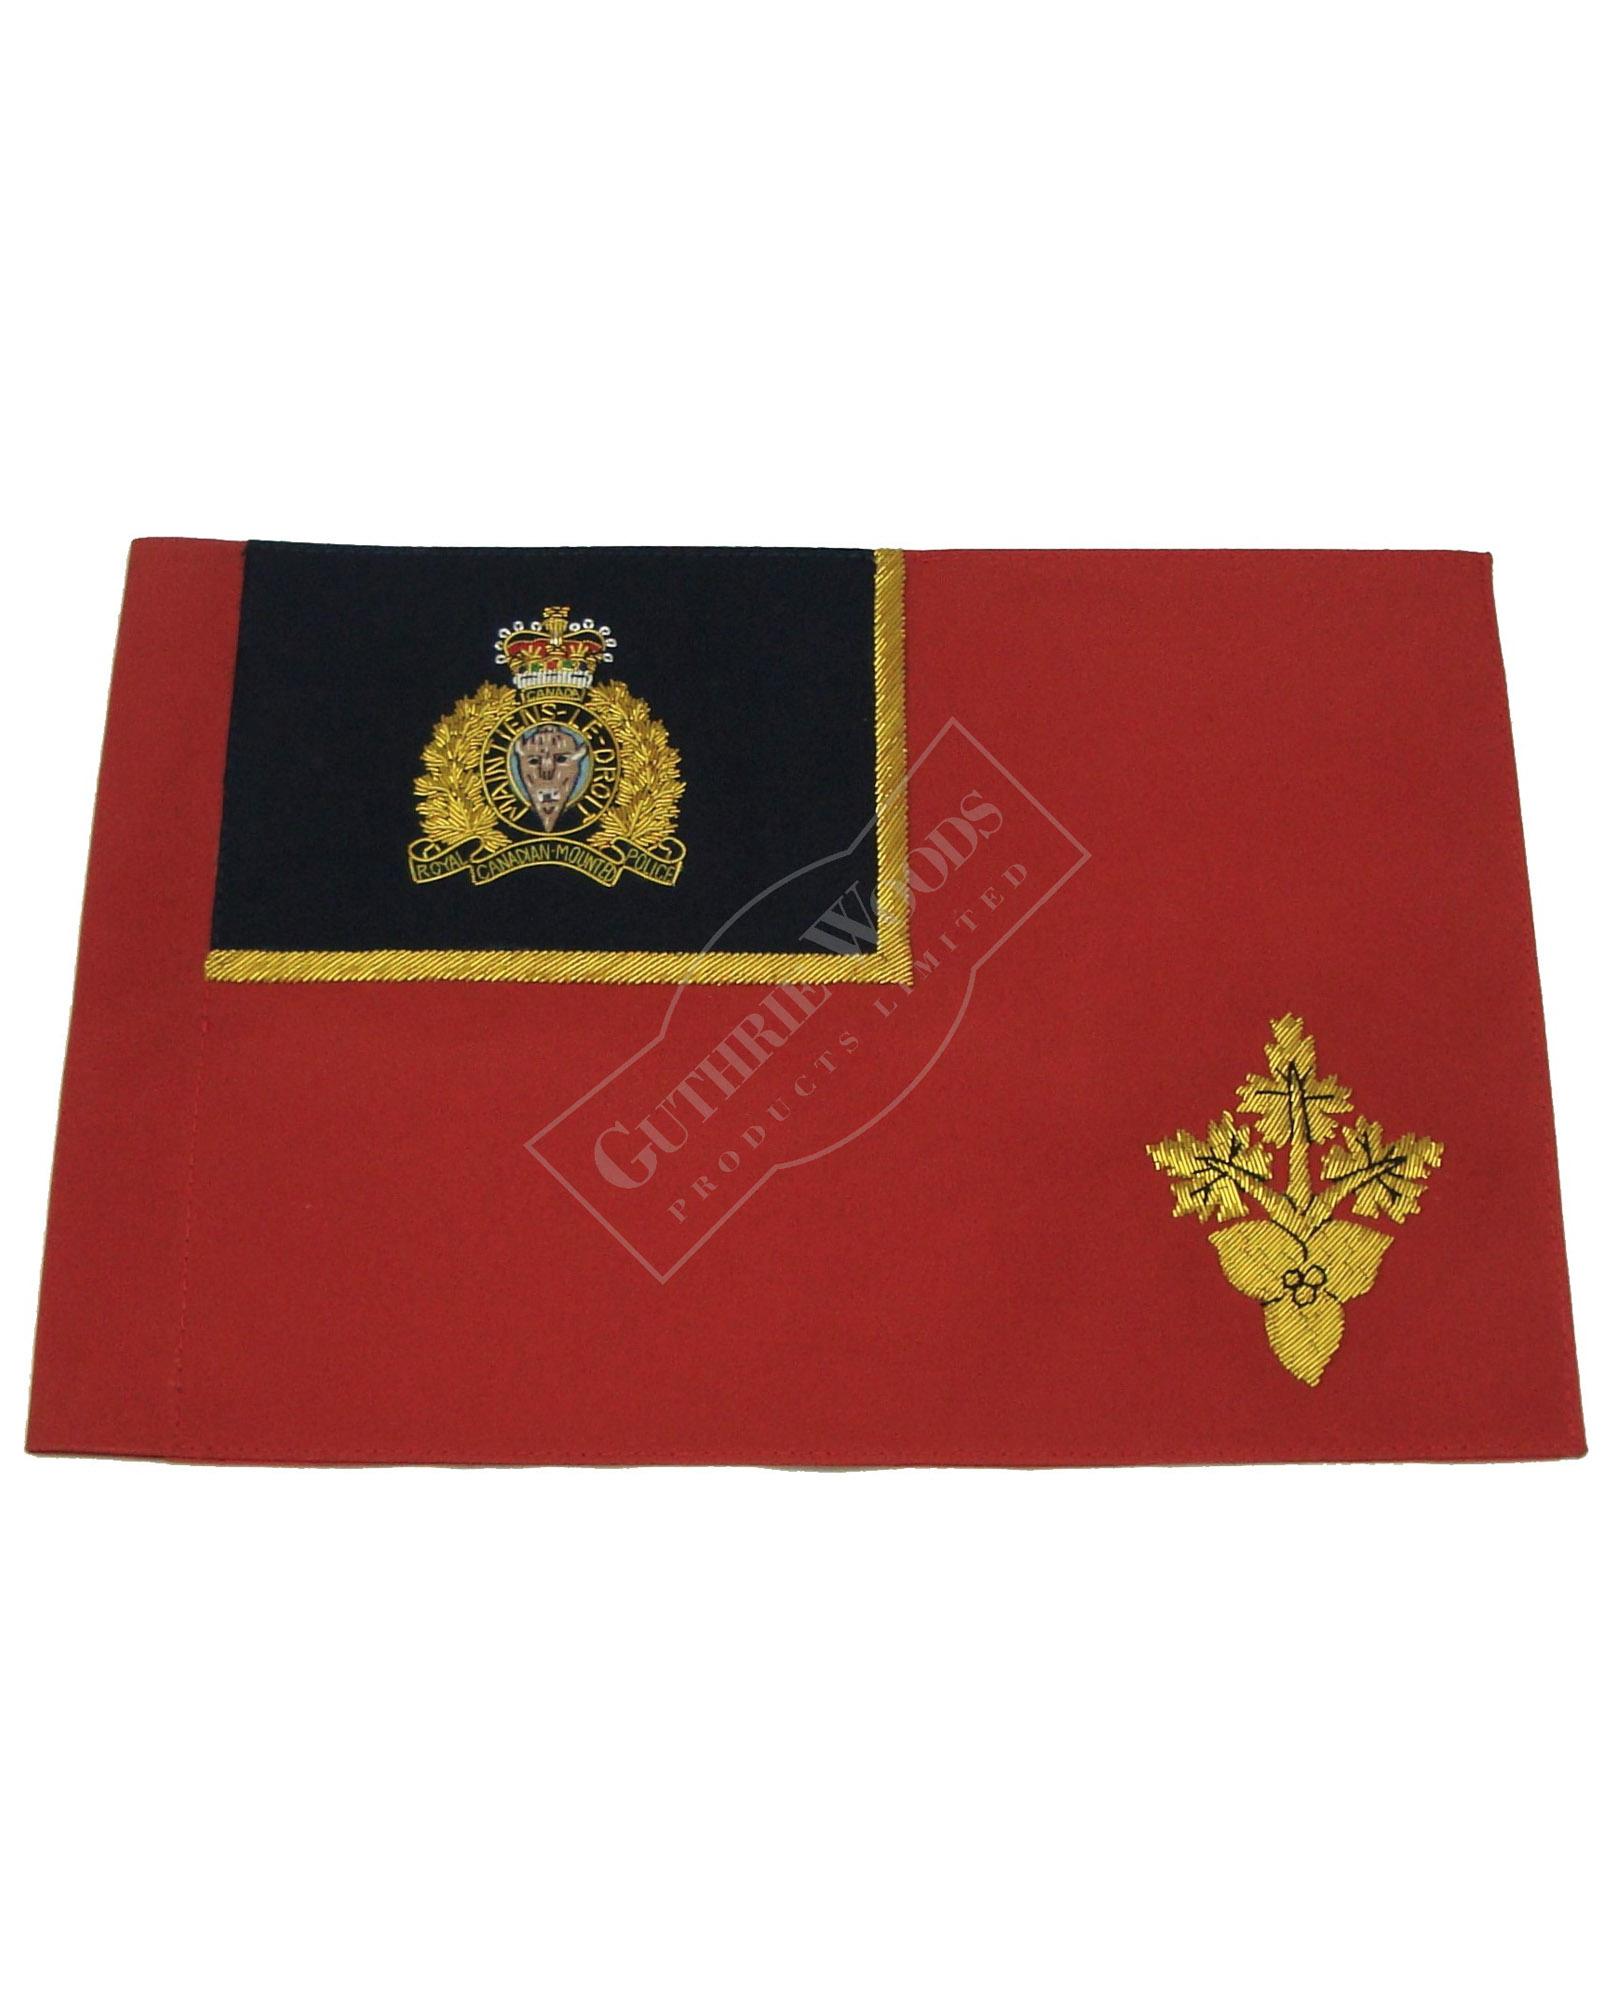 RCMP Miniature Division Ensign R173-ODIV